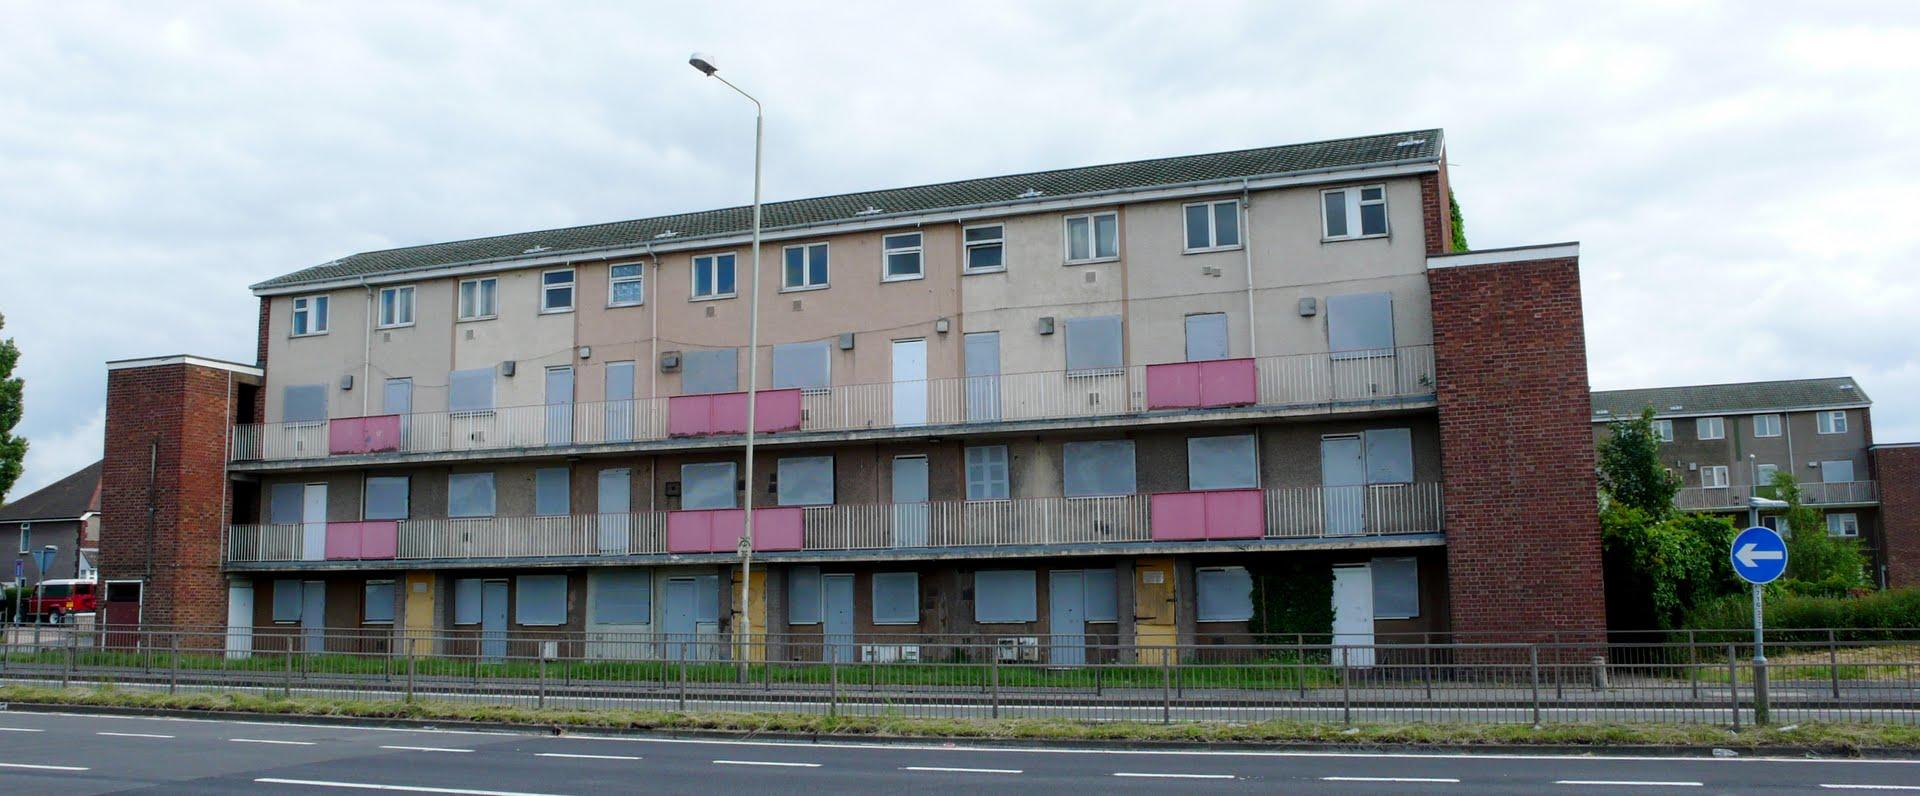 New Build Flats Nottingham